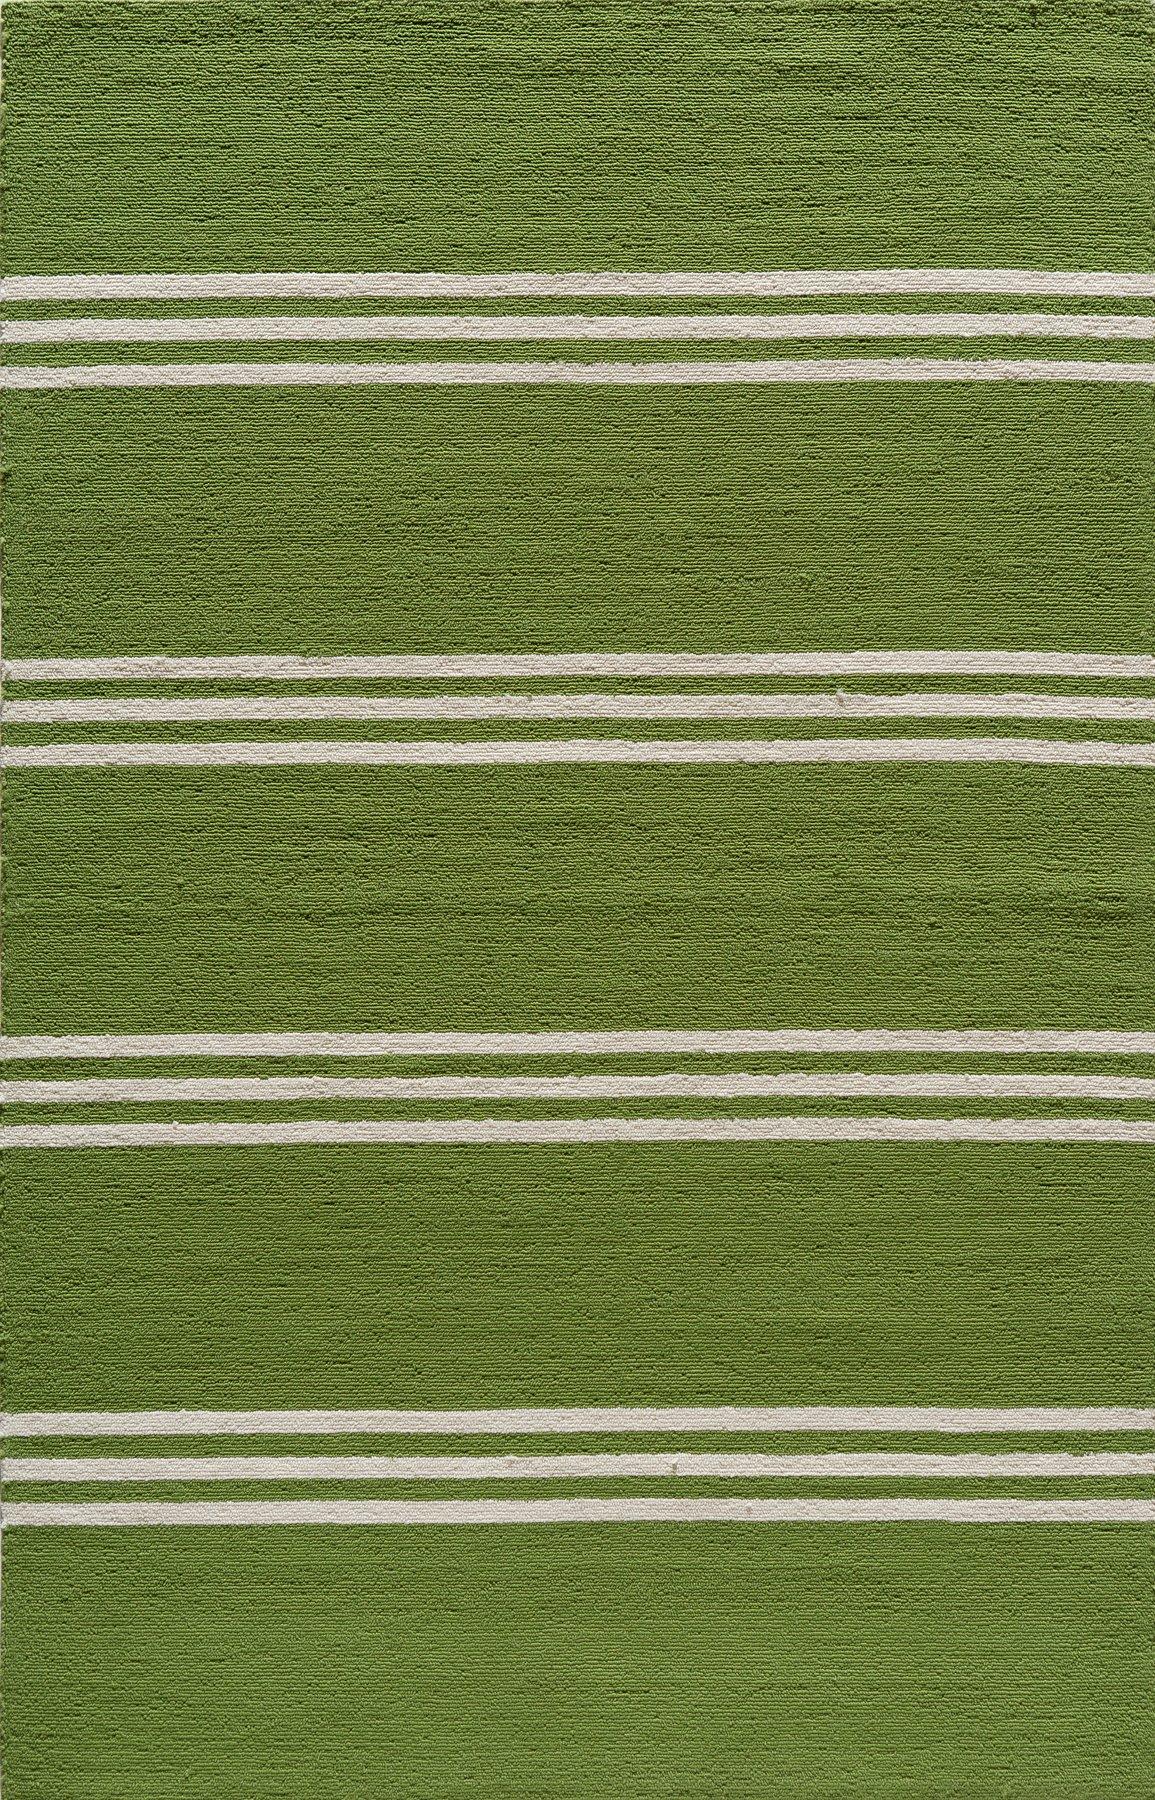 Nolita Rugs Blaney Polypropylene Lime Indoor/Outdoor Rug 8' X 10' by Nolita Rugs